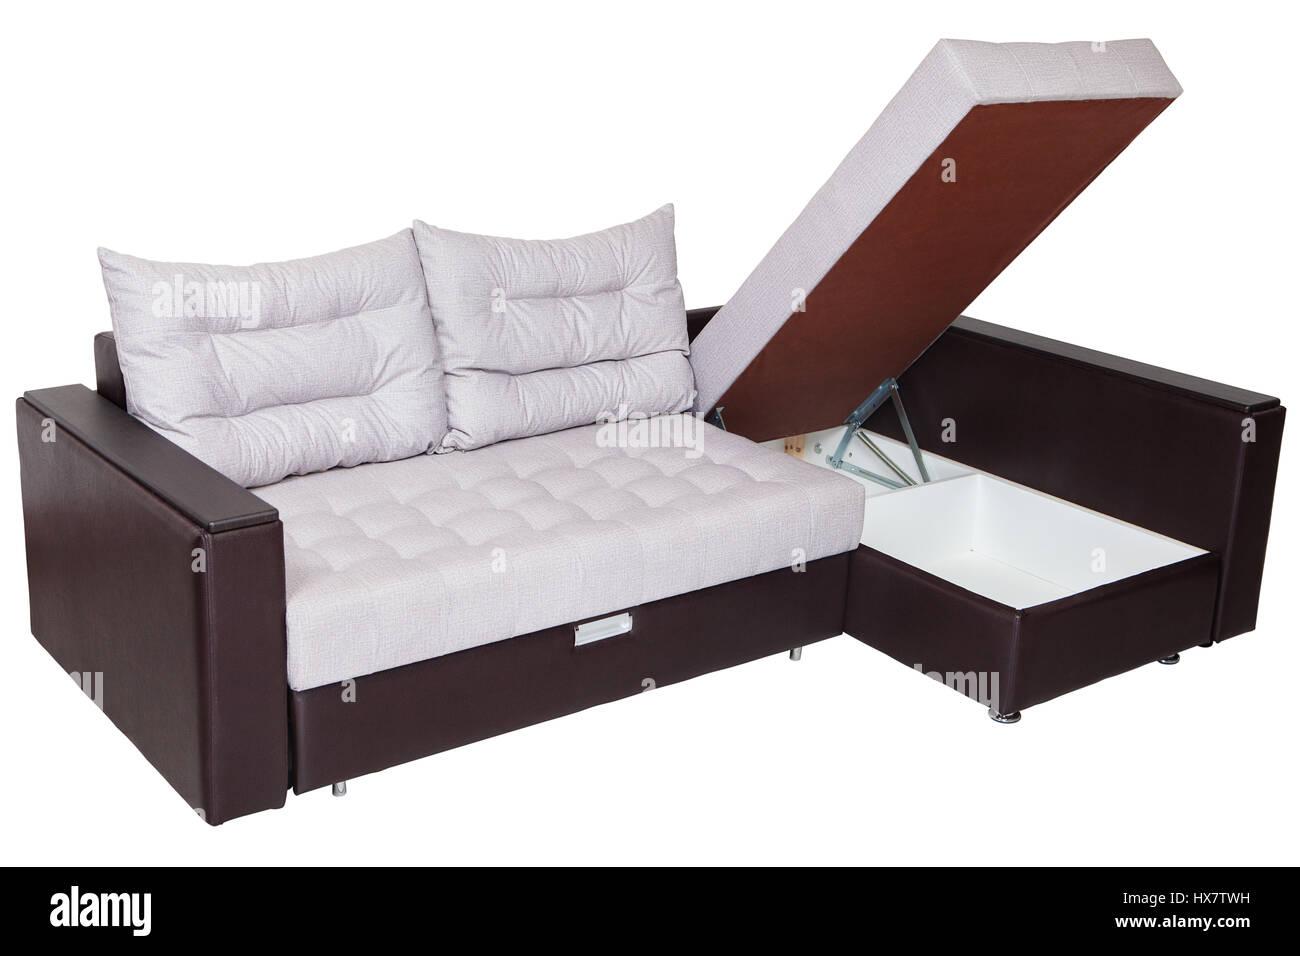 Marvelous Corner Convertible Sofa Bed With Storage Space Upholstery Inzonedesignstudio Interior Chair Design Inzonedesignstudiocom